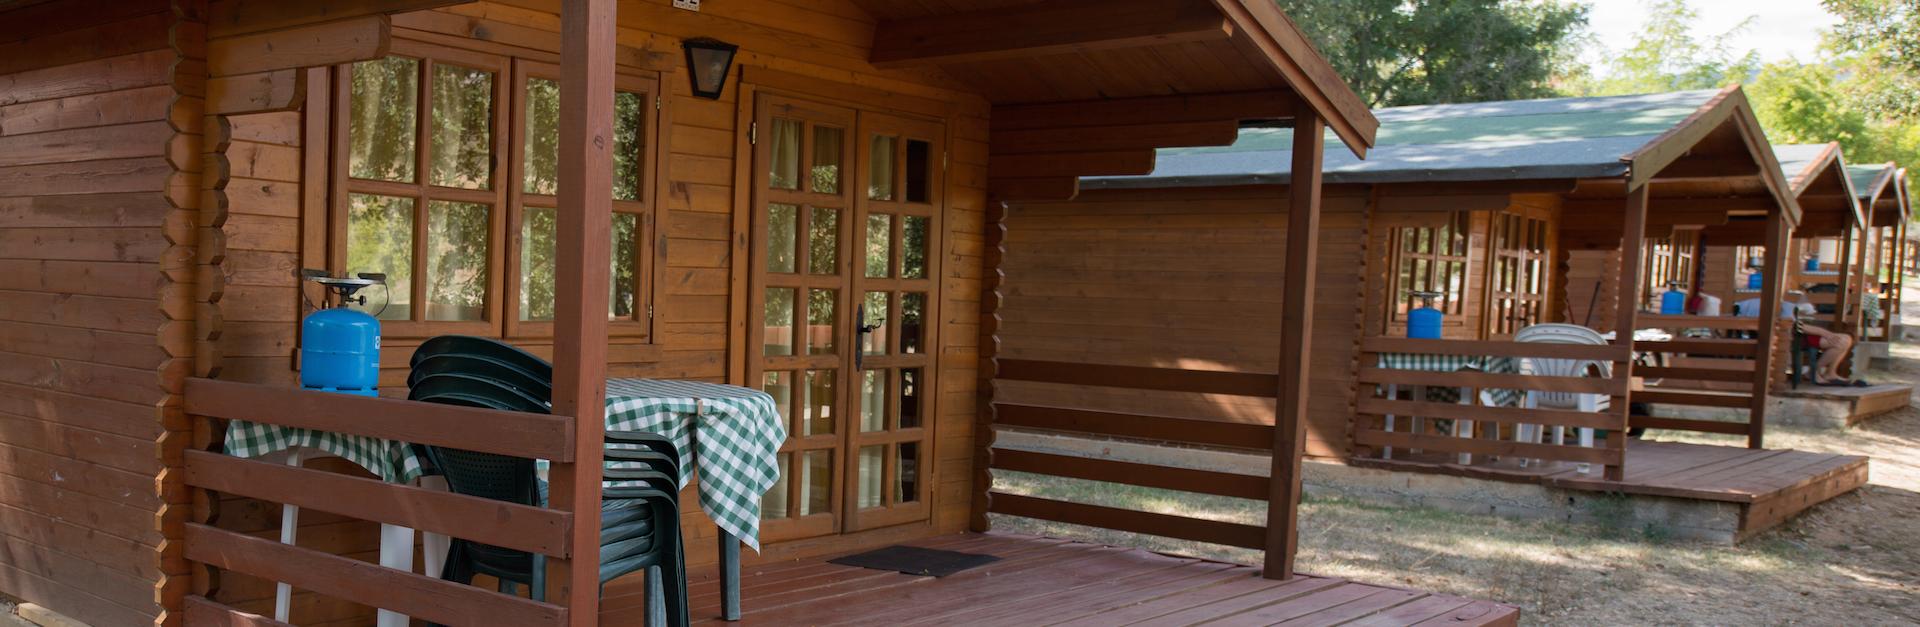 gem tliche bungalows ferienh user in den pyren en i spanien. Black Bedroom Furniture Sets. Home Design Ideas